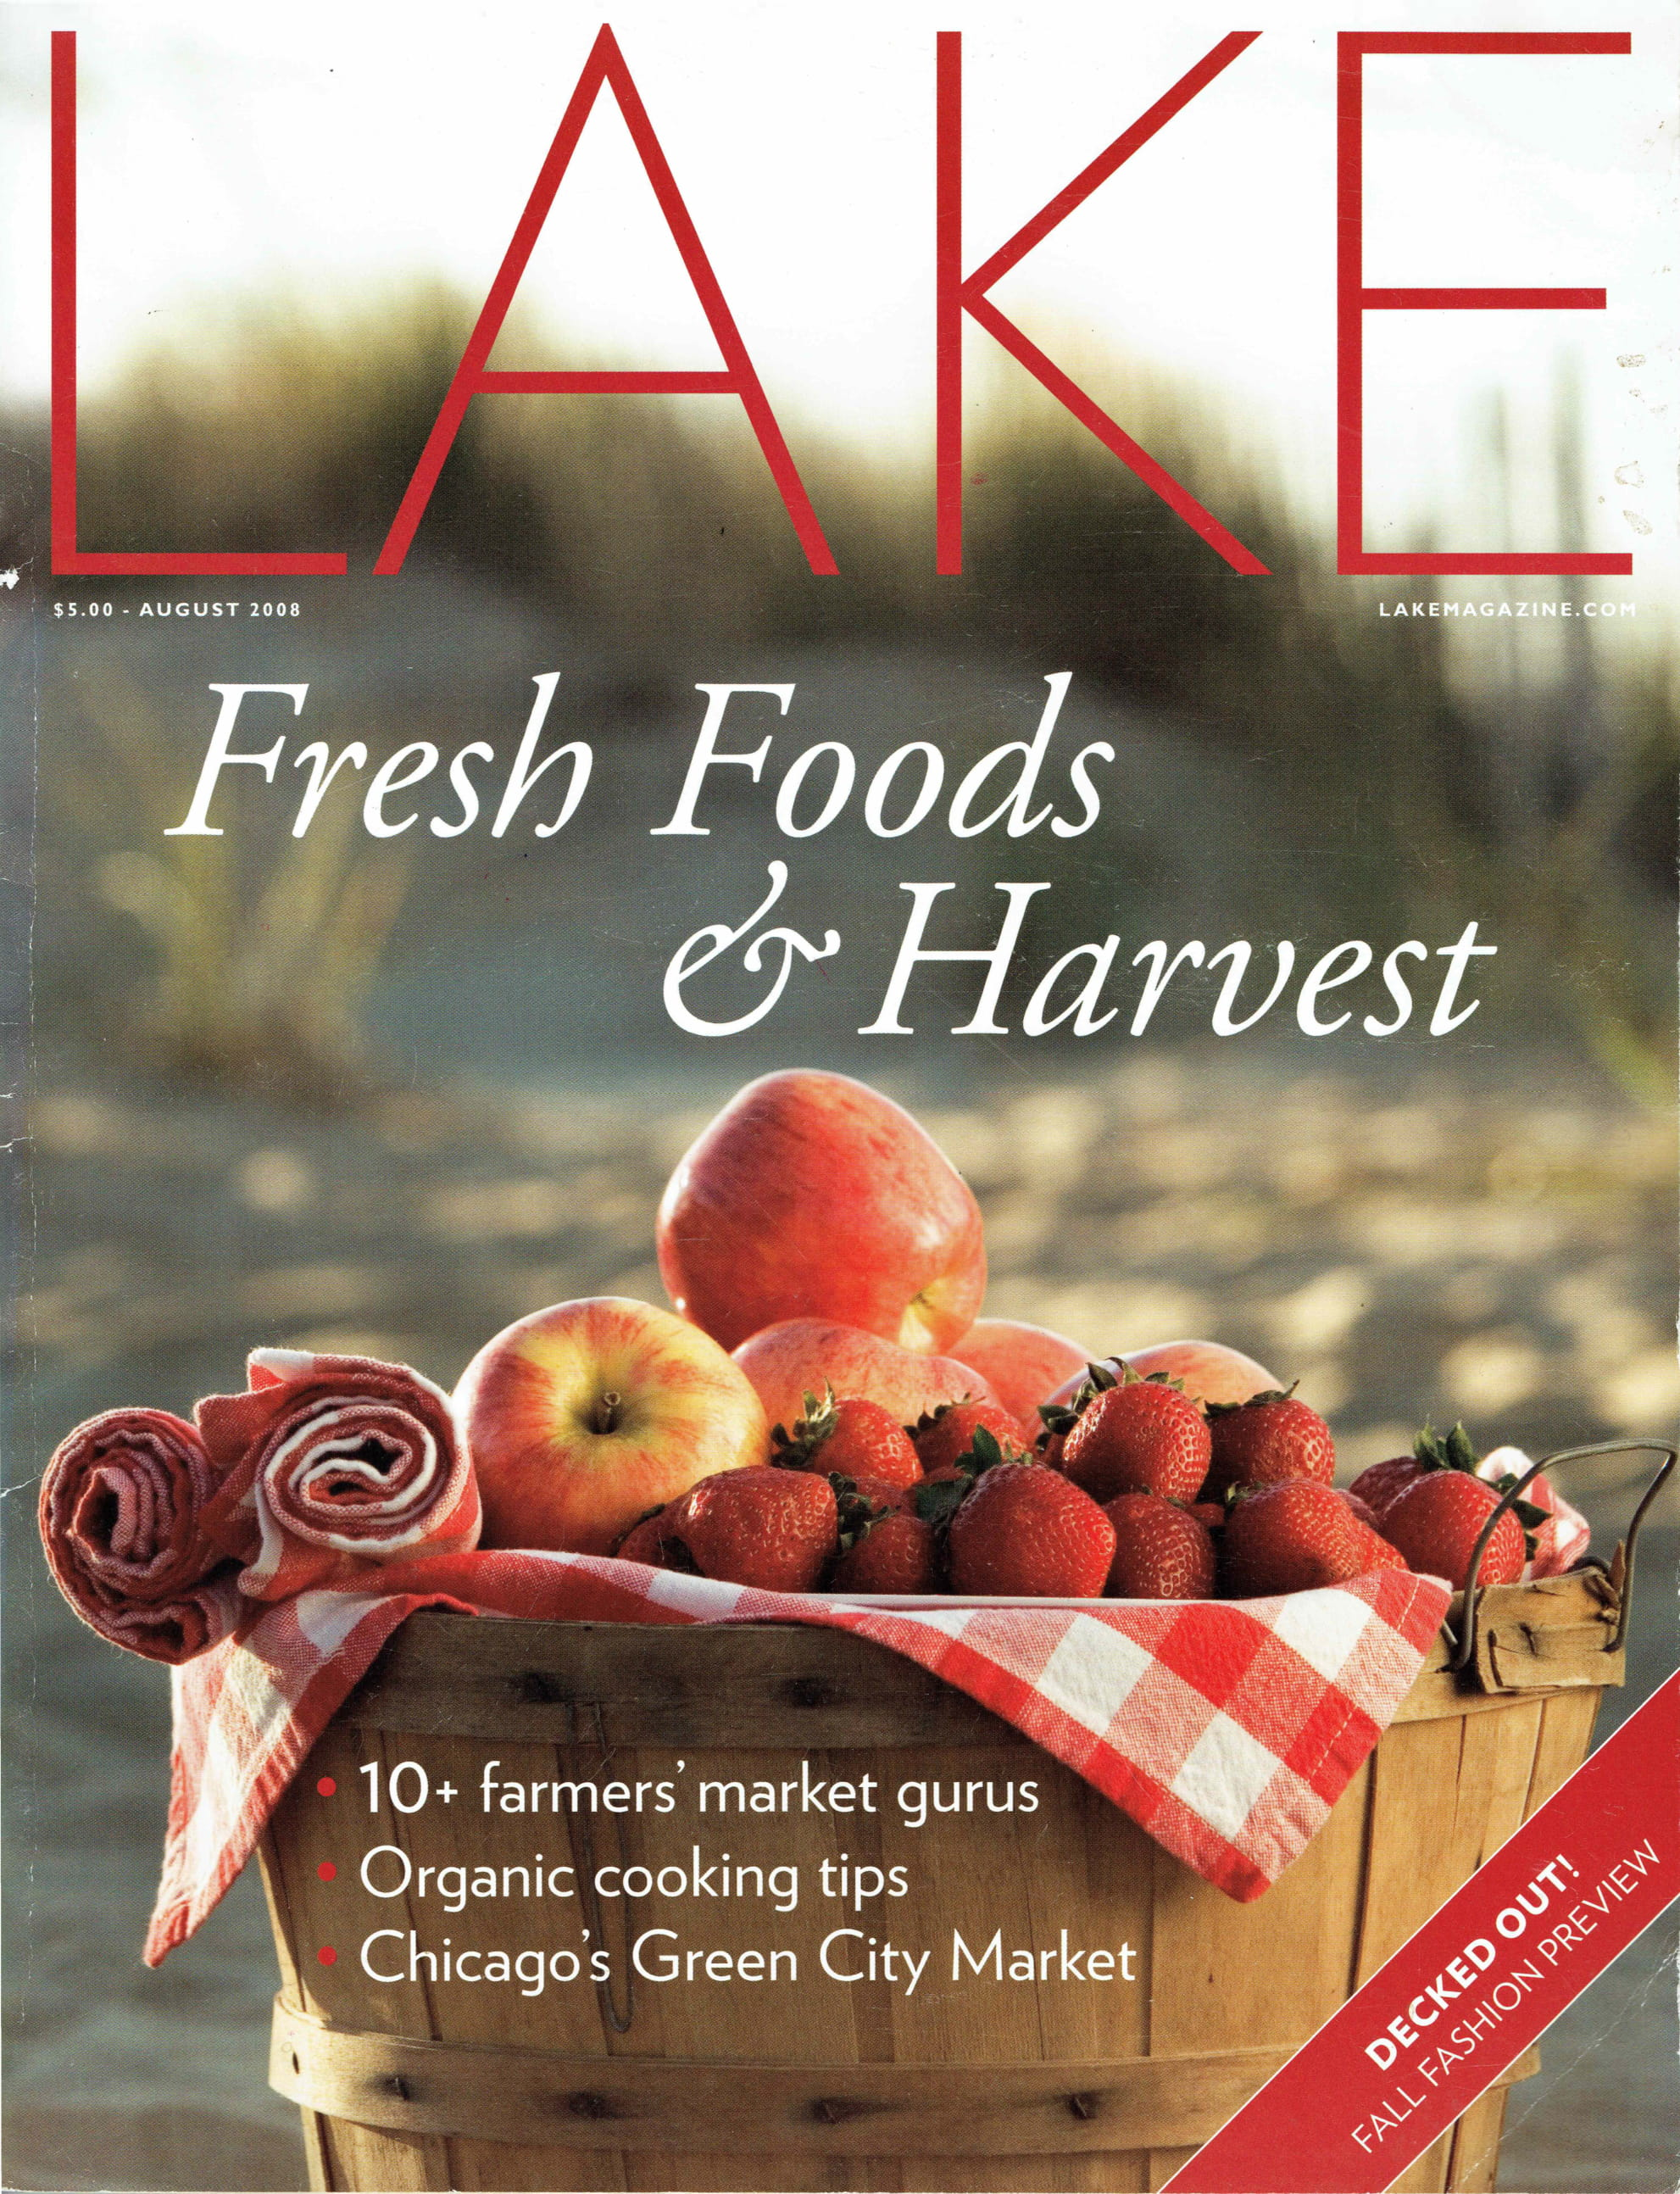 Lake Magazine - Aug 2008 Cover-1